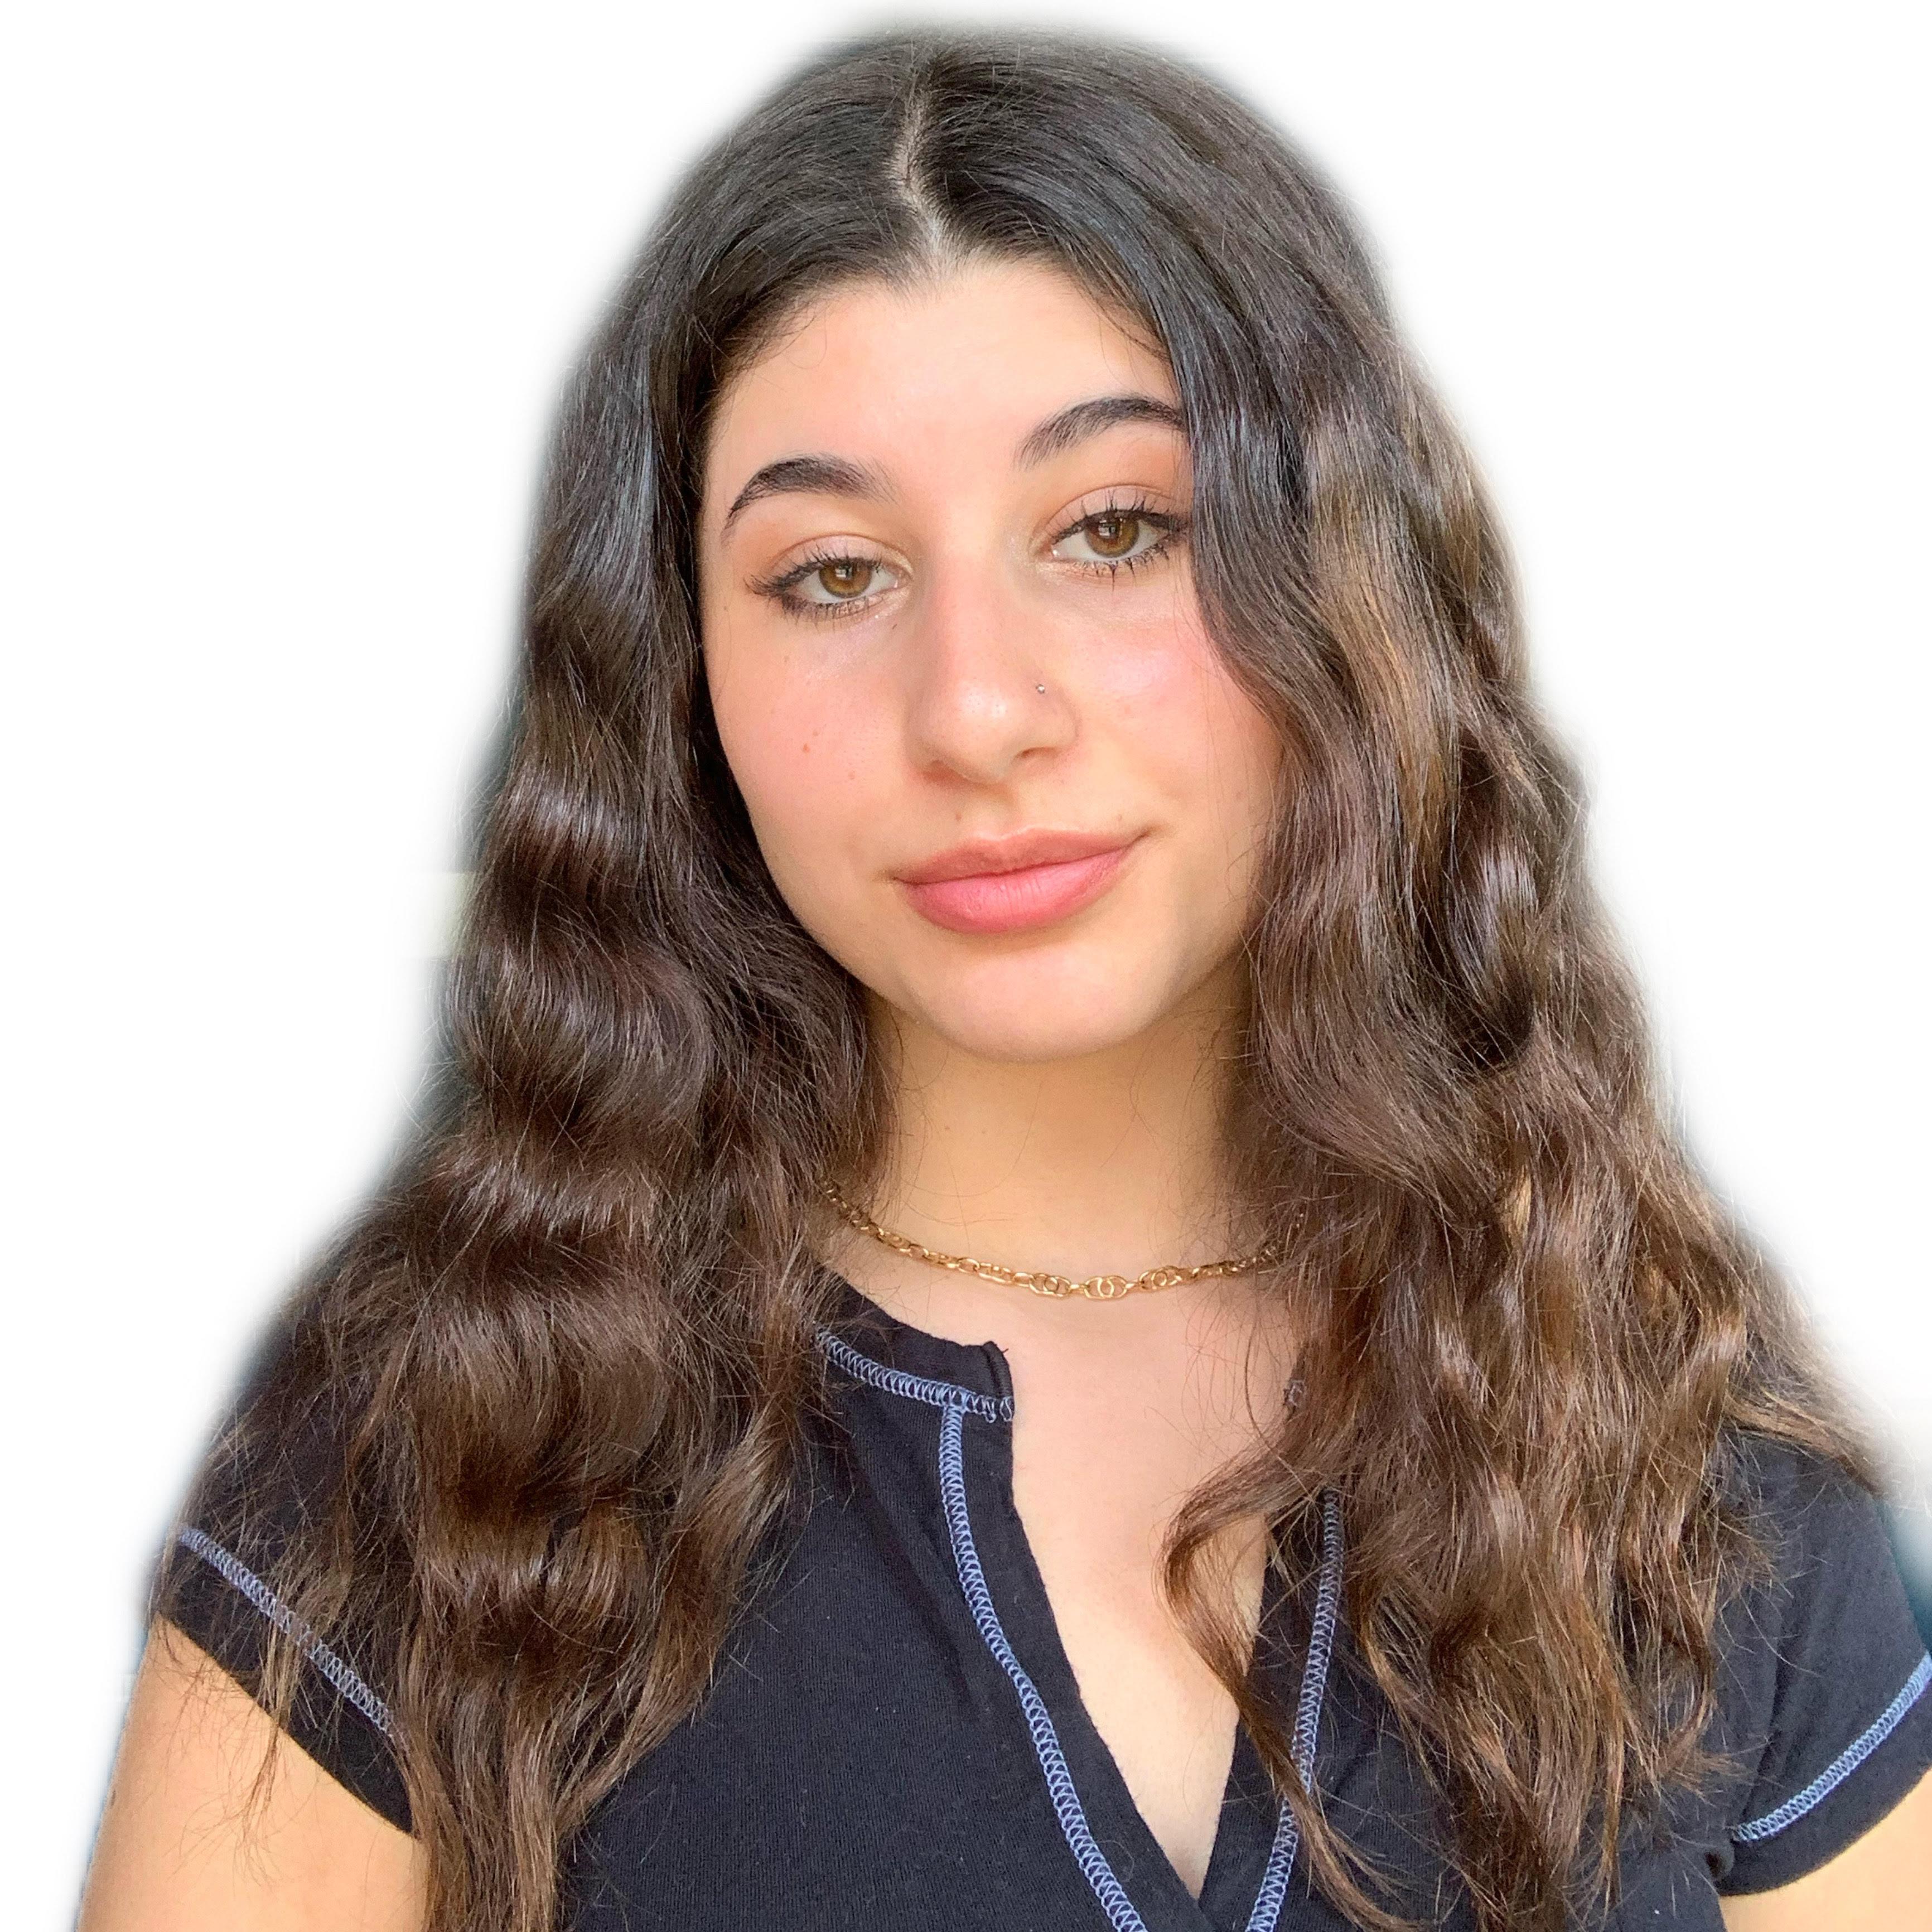 Talia Zitner